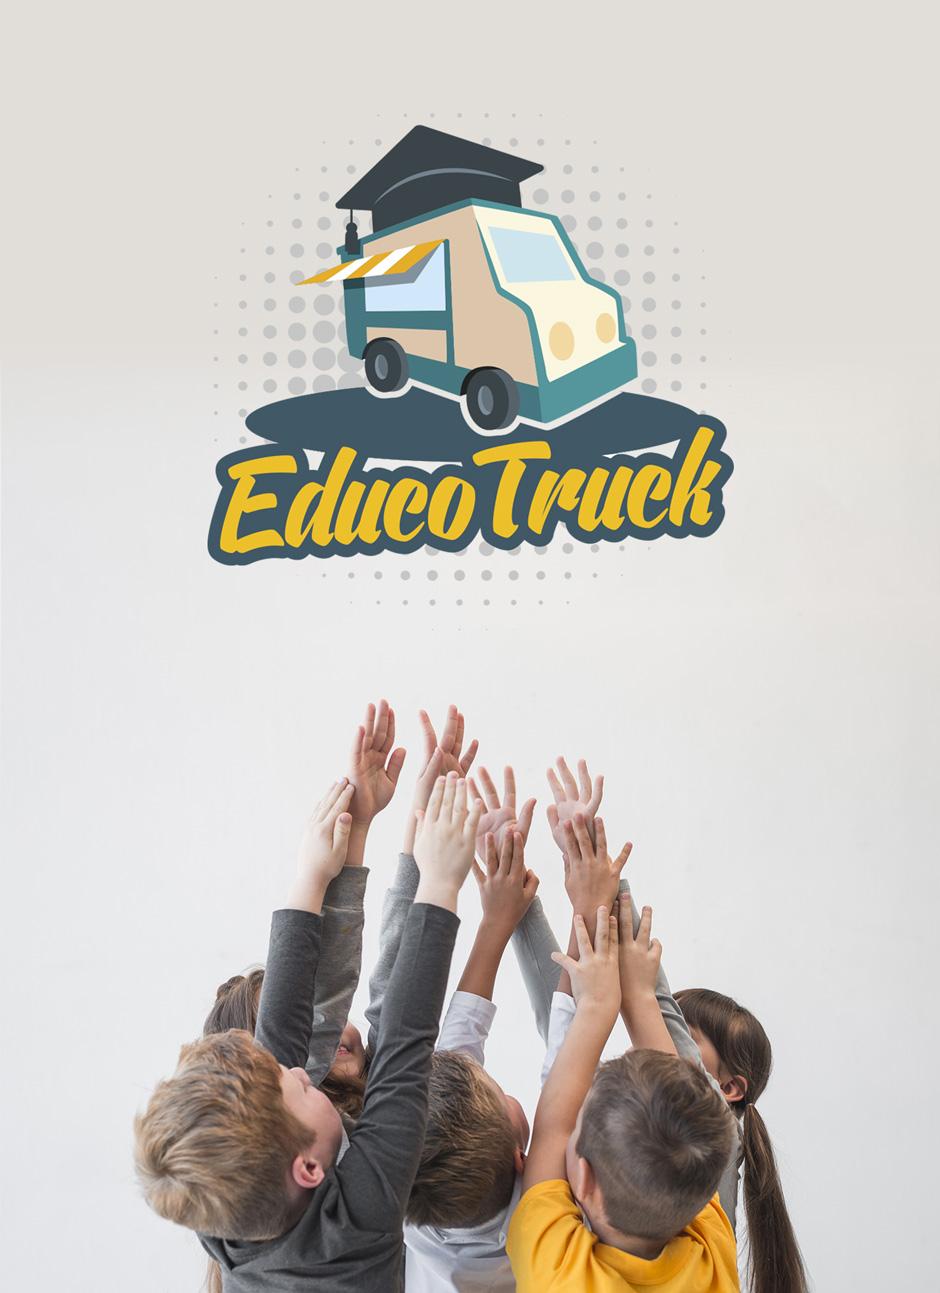 Educotruck-logotipo-palencia-identidad-corporativa-educacion-3